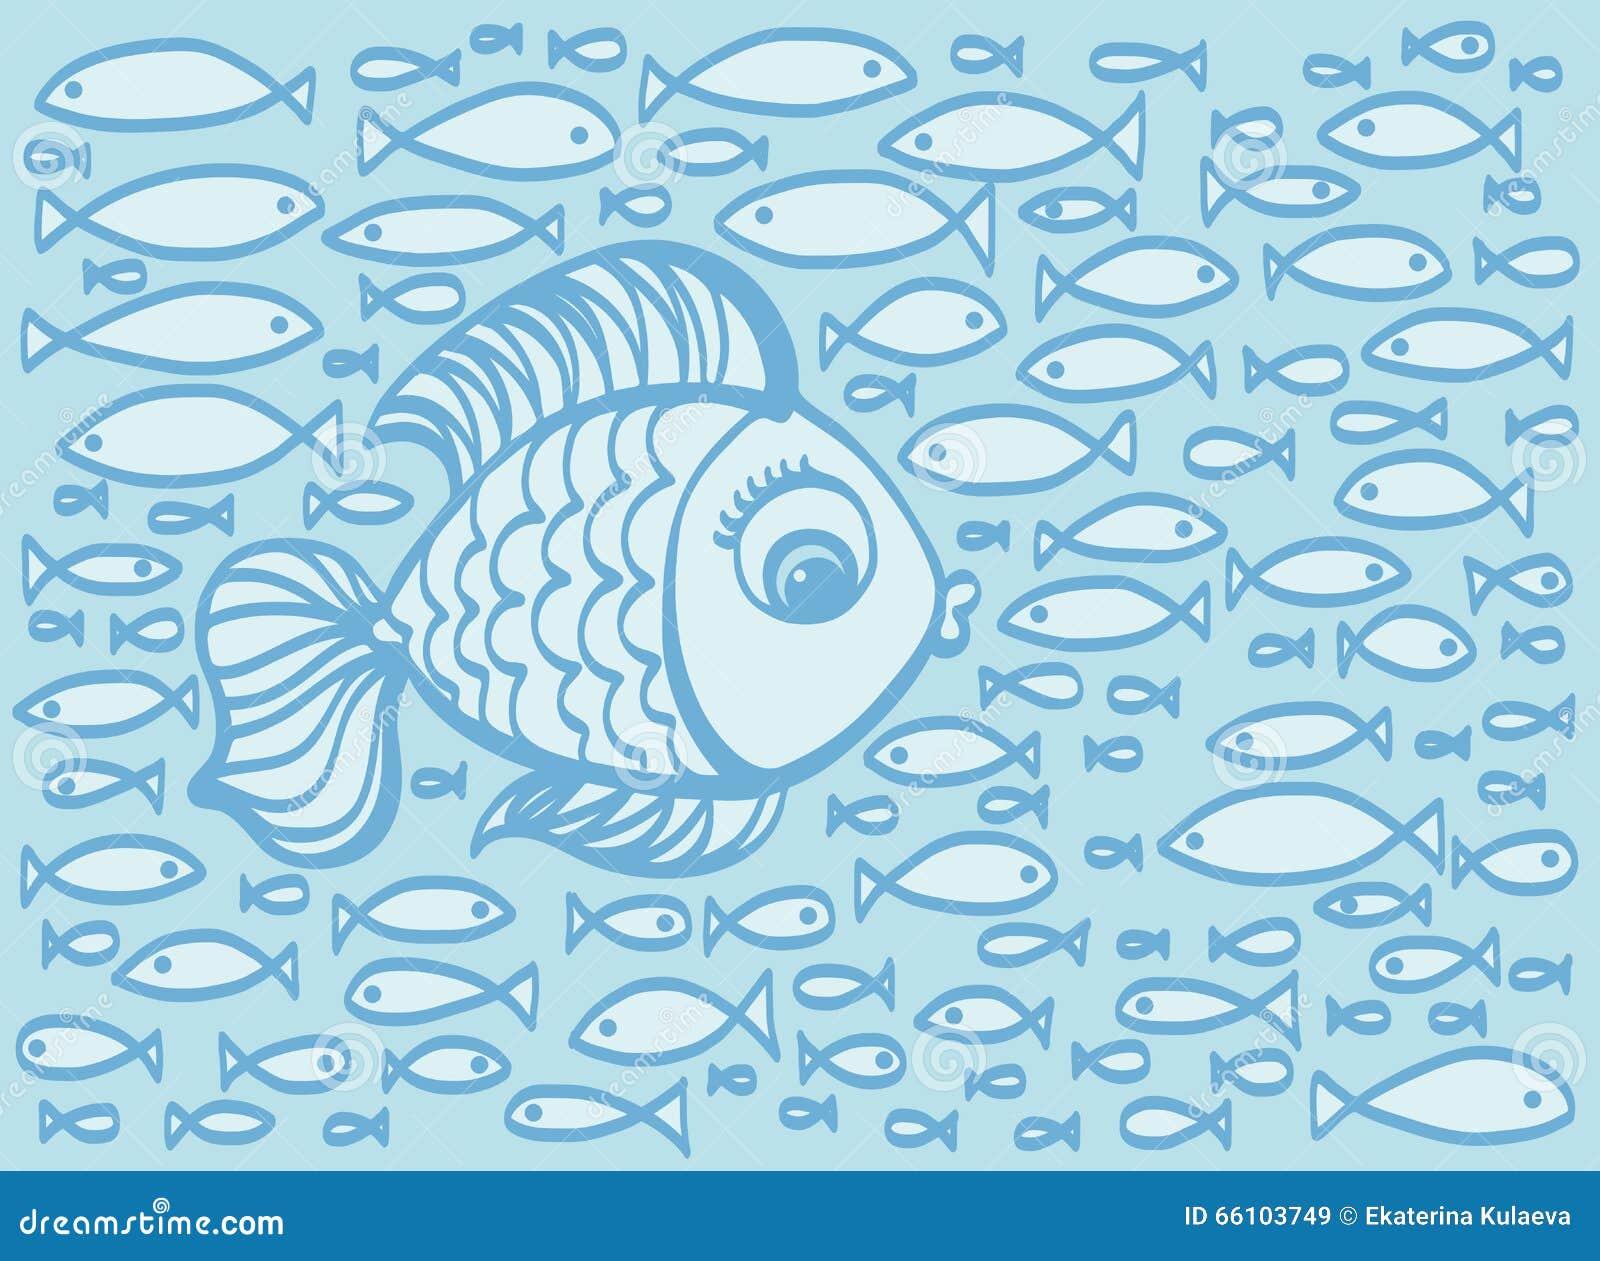 Cute Cartoon Hand Drawn Fish Illustration Stock Vector